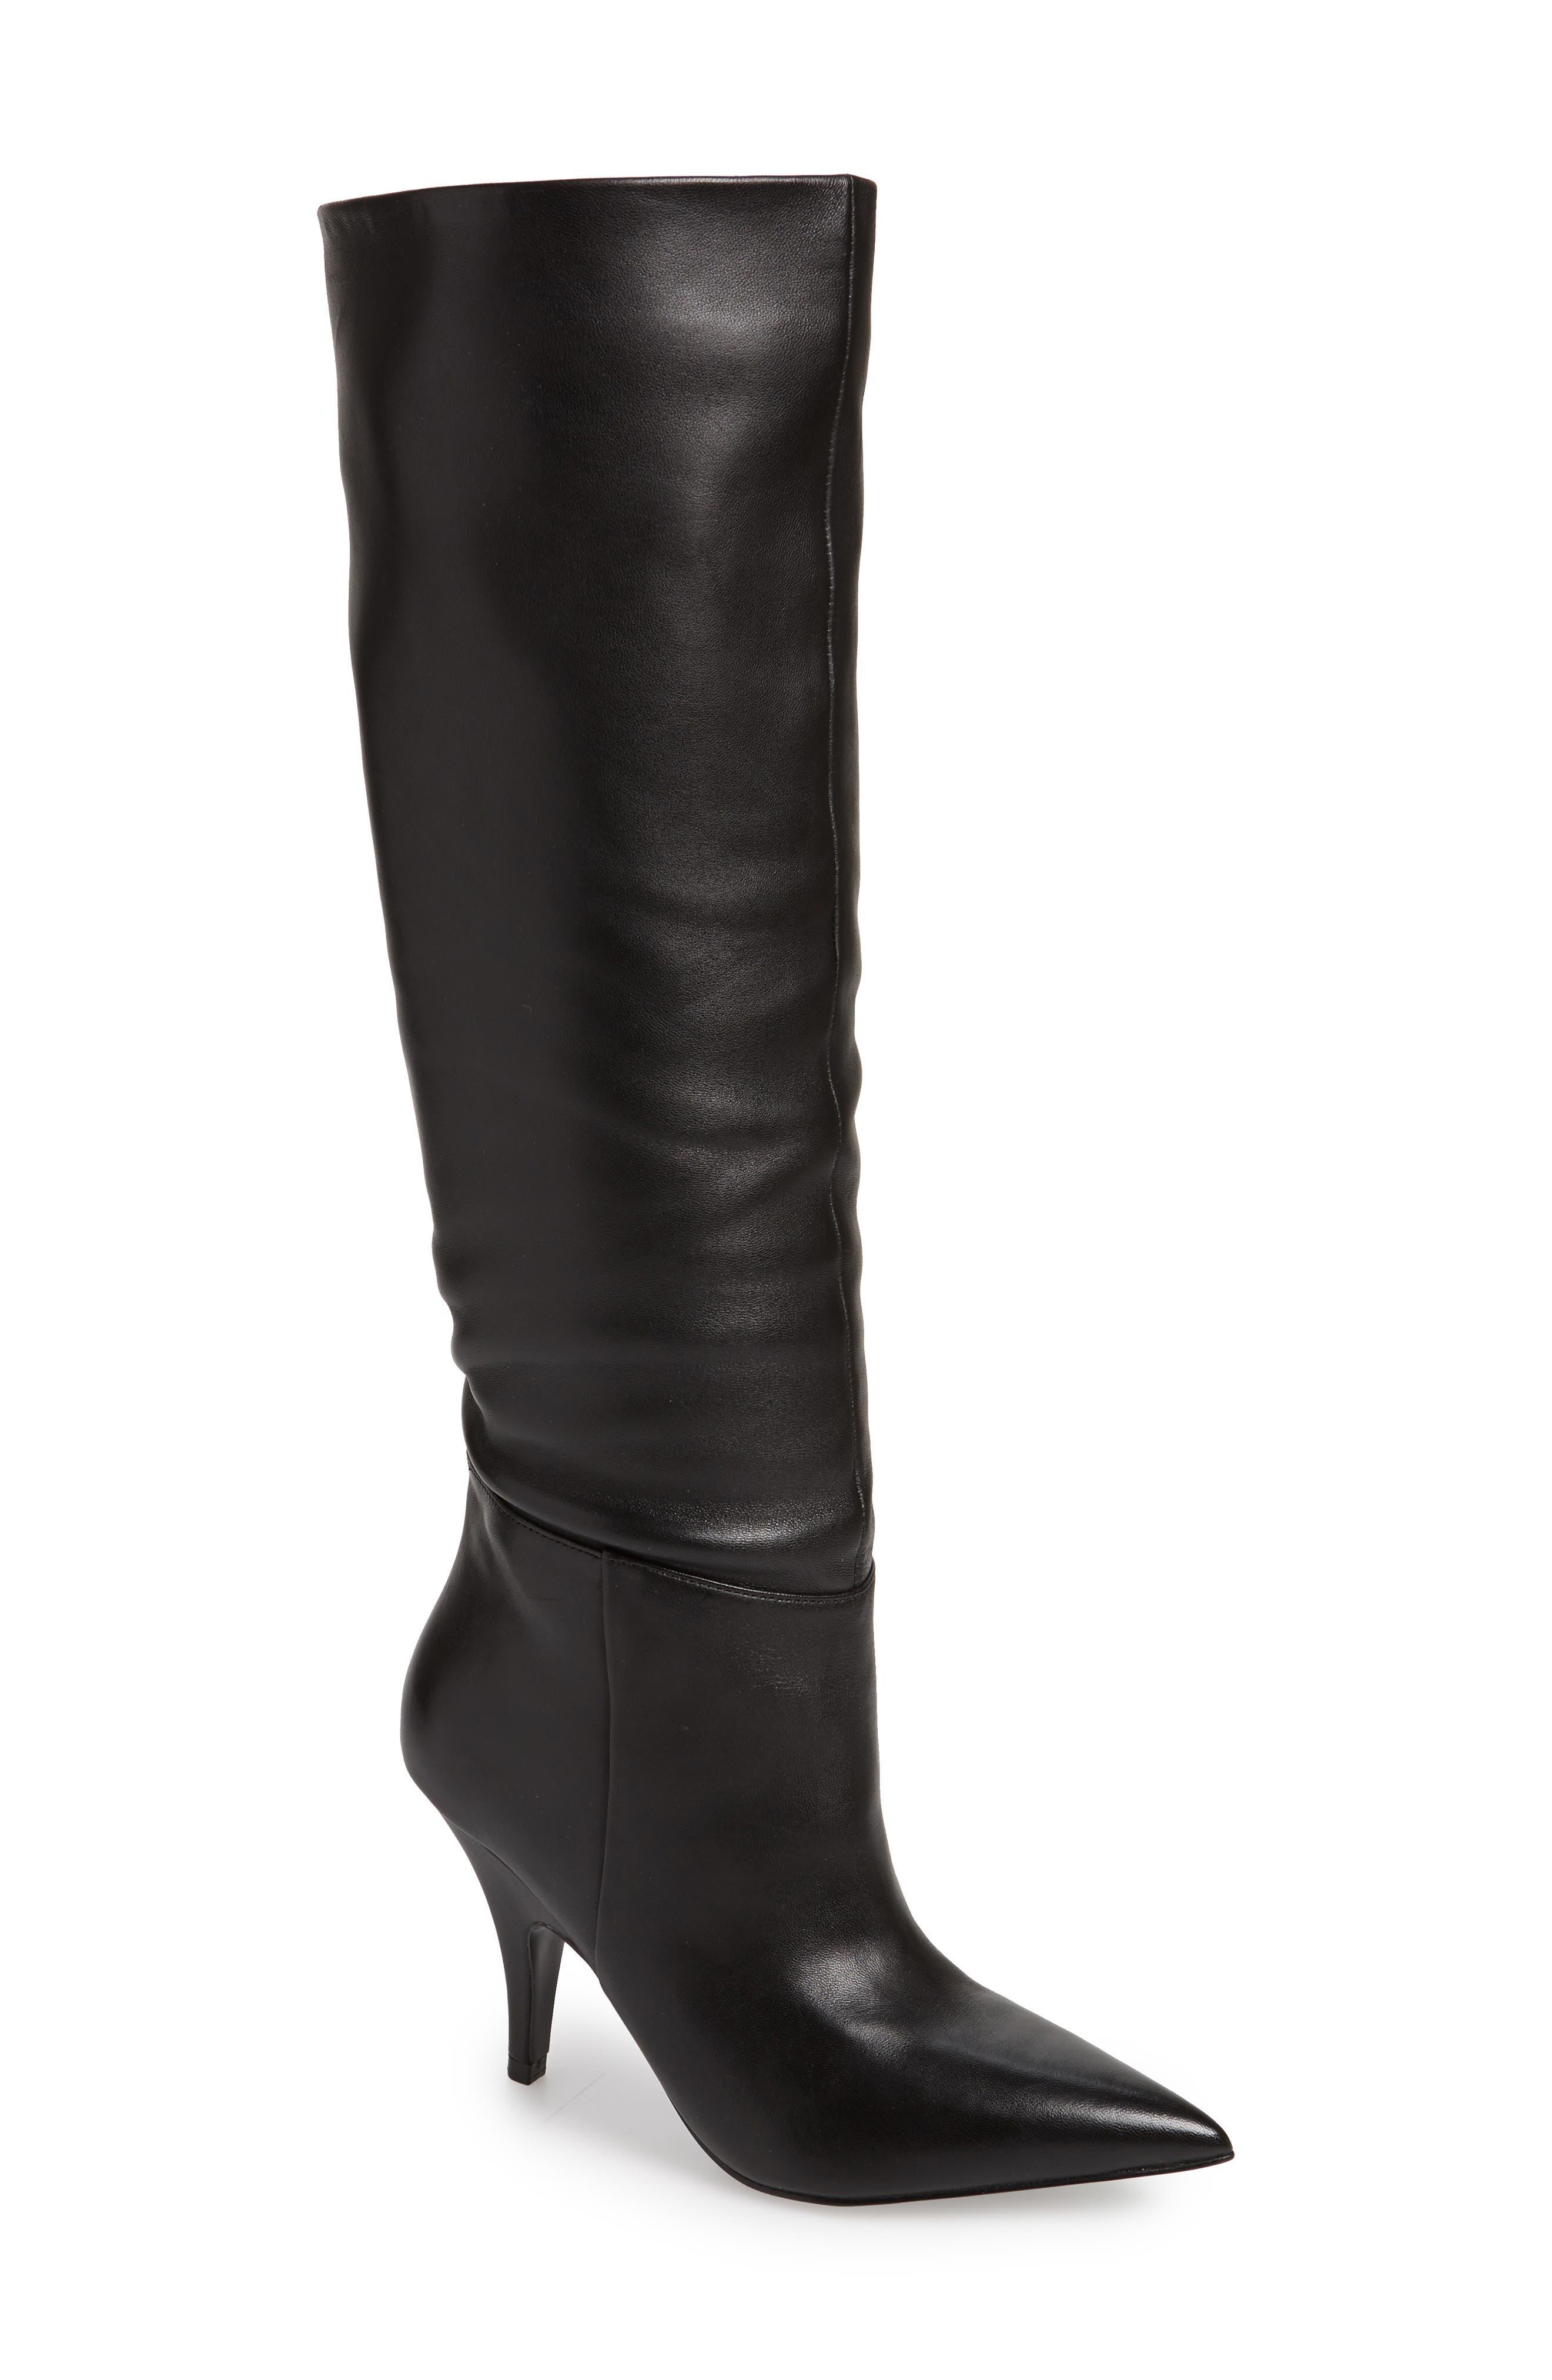 KENDALL Knee KYLIE Women Boot Calla High rwHBOwqYE